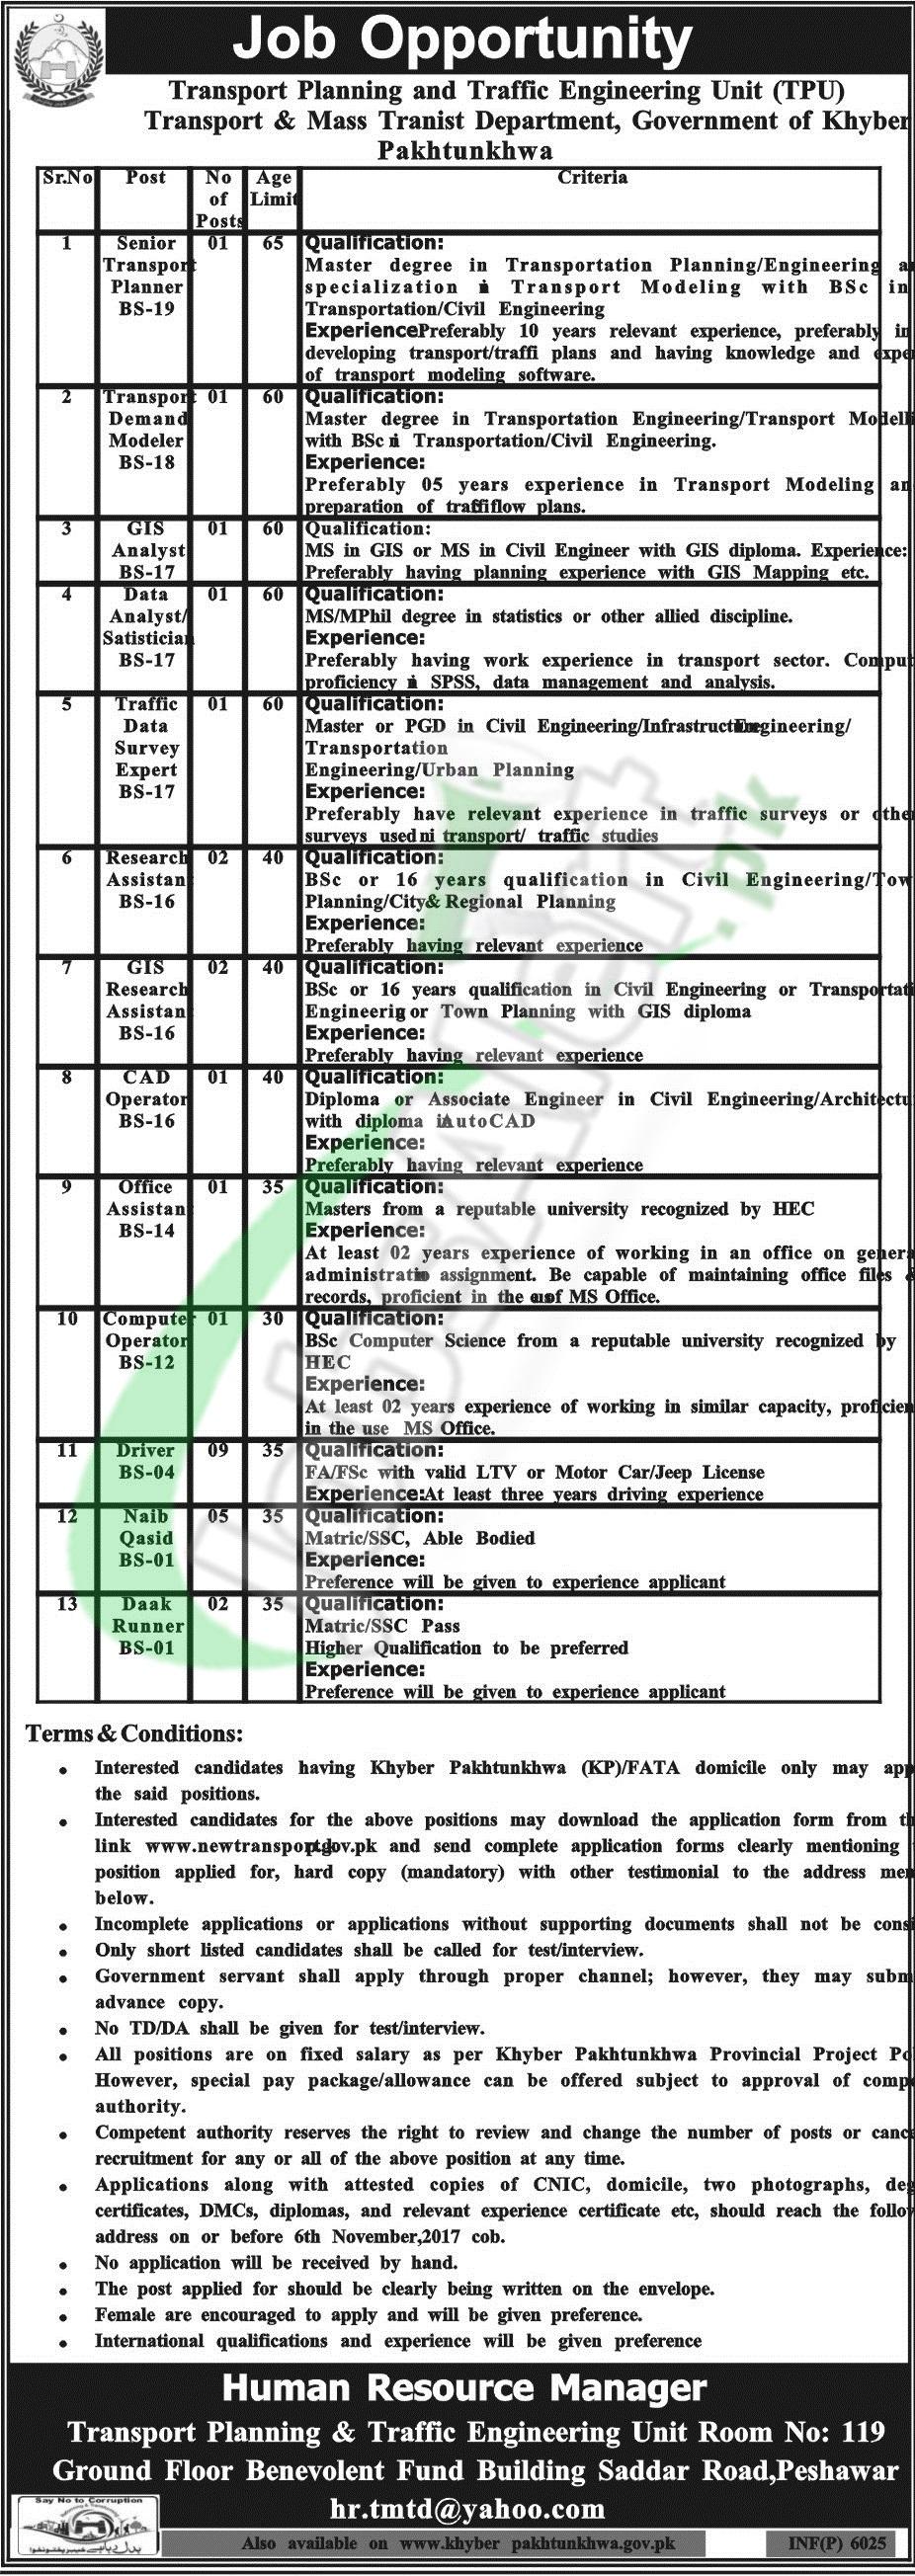 Transport Planning & Traffic Engineering Unit Peshawar Jobs 2017 ...